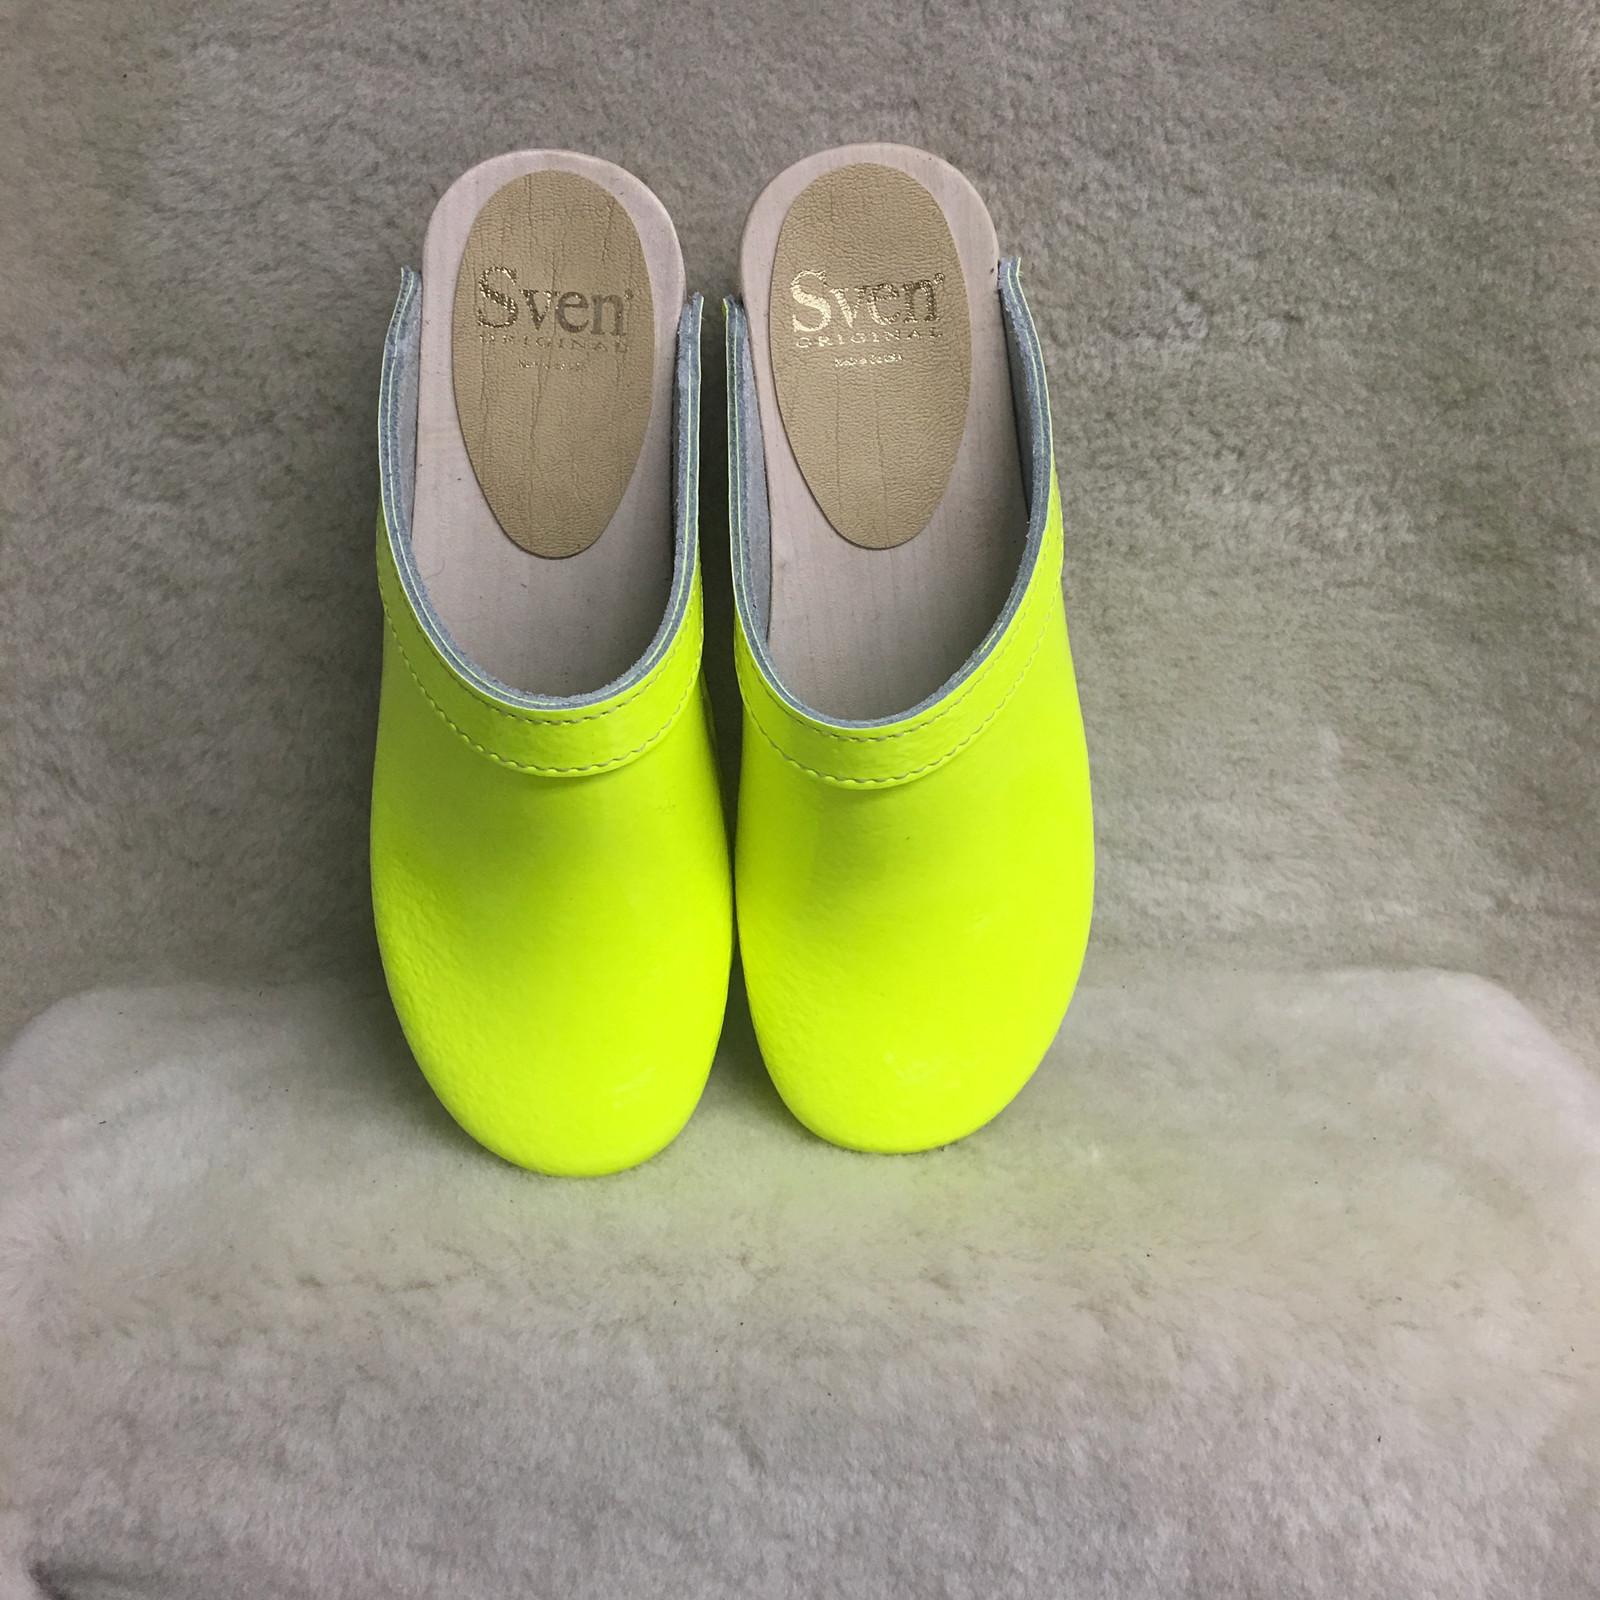 Neon Yellow - Plain Clogs